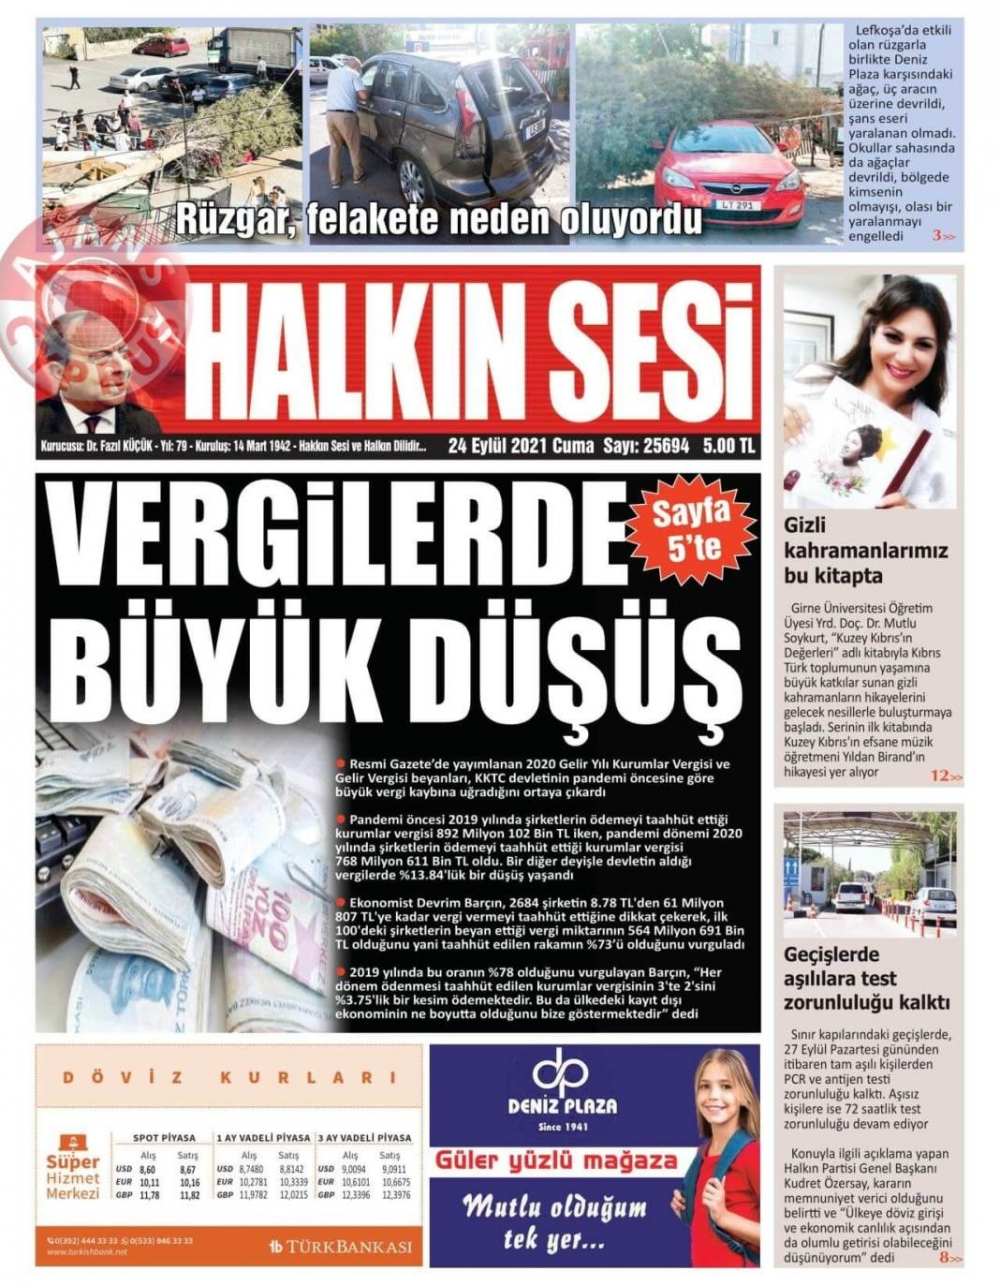 KKTC'de Gazeteler Bugün Ne Manşet Attı? (24 Eylül 2021) galerisi resim 1